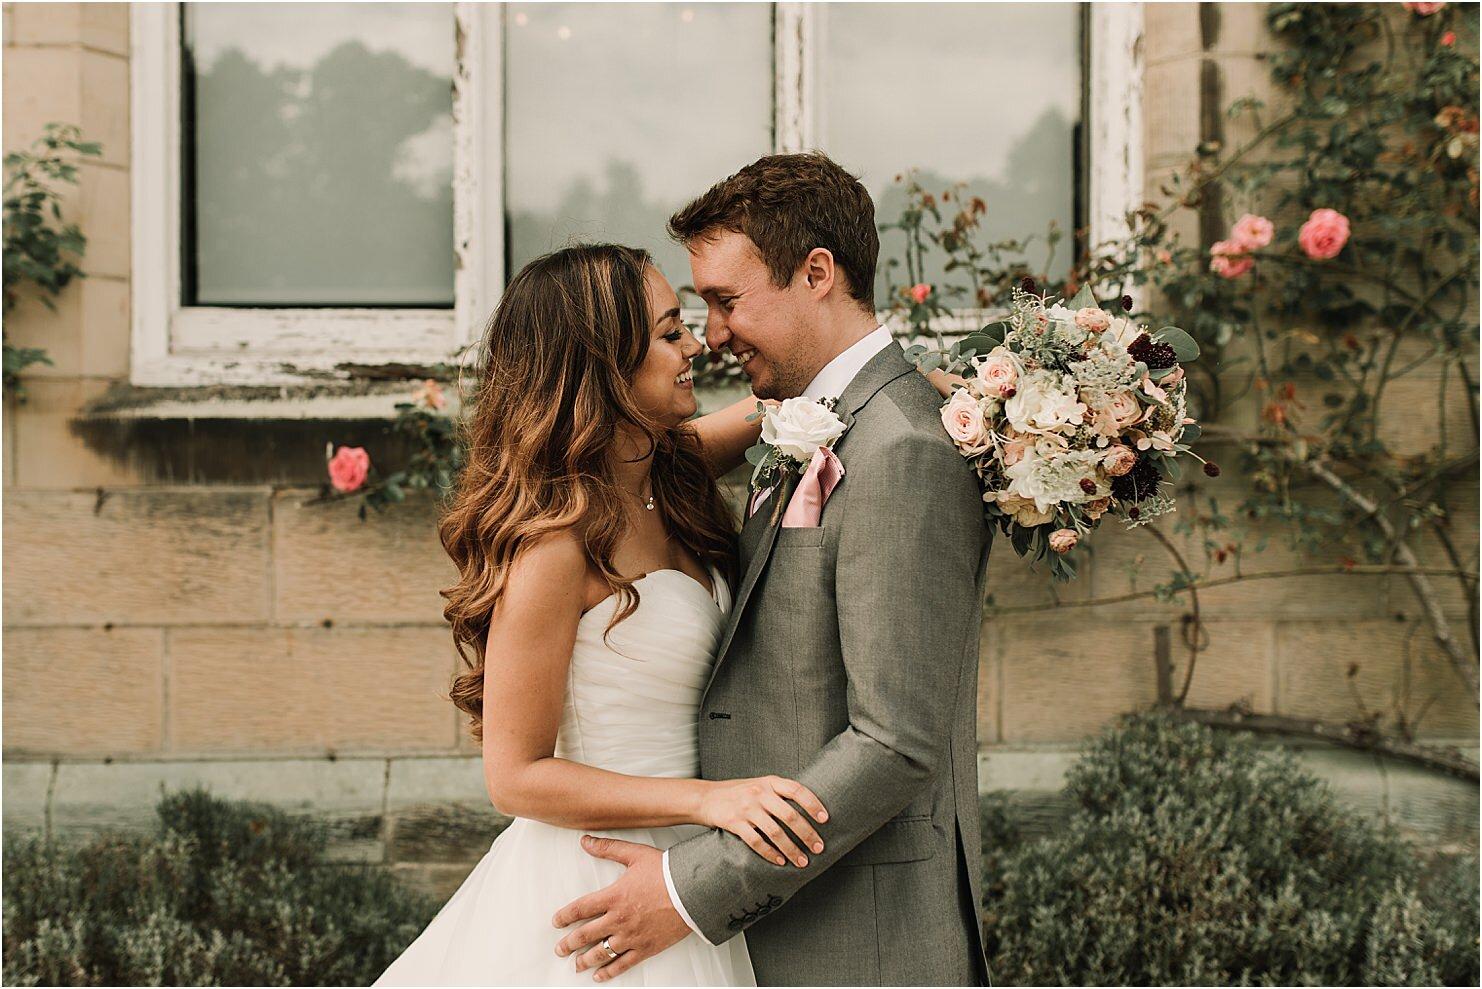 boda-de-cuento-en-castillo-boda-en-londres-64.jpg